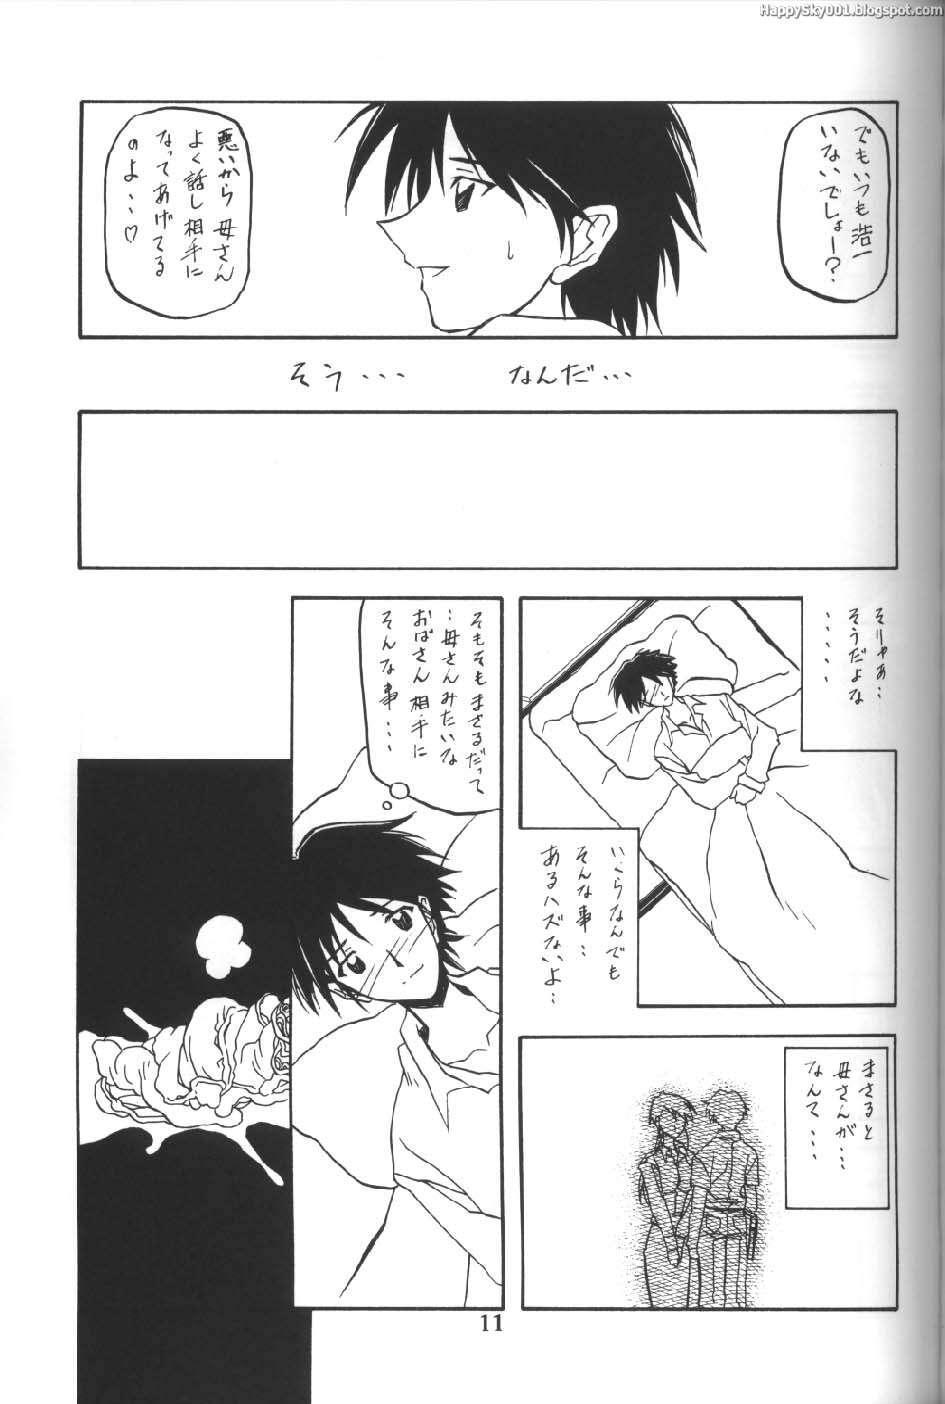 Yama Hime no Mi 9